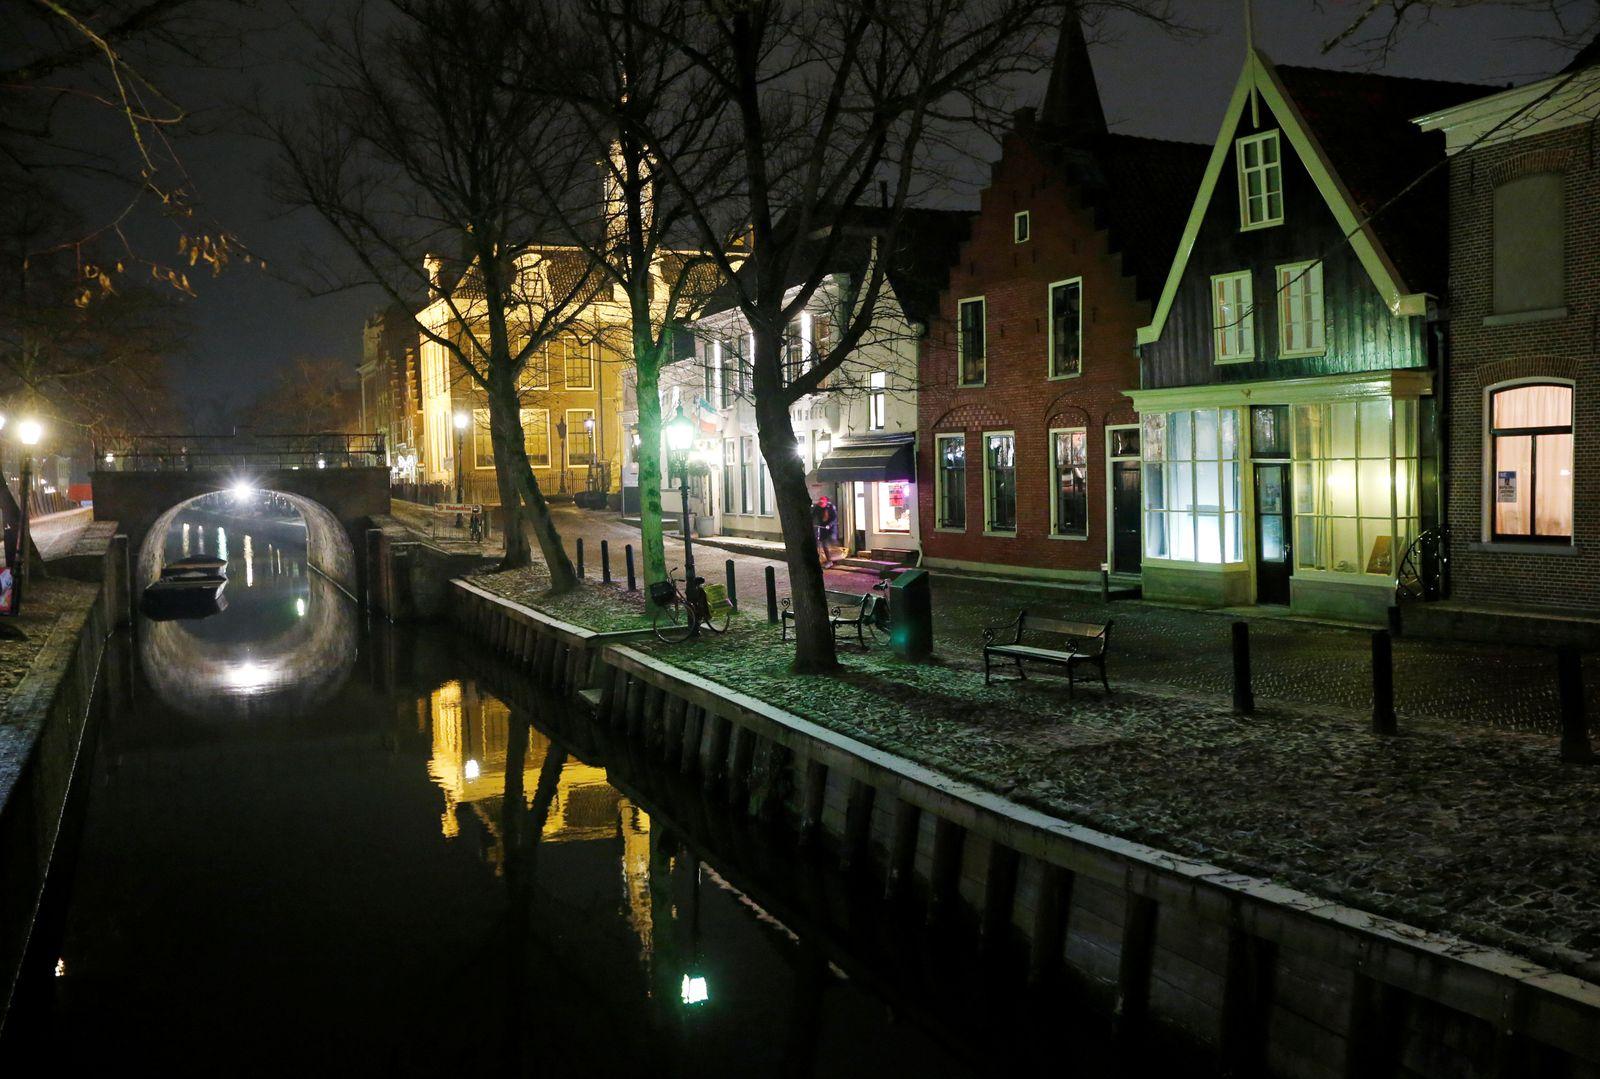 FILE PHOTO: View of a canal at night in Edam-Volendam near Amsterdam